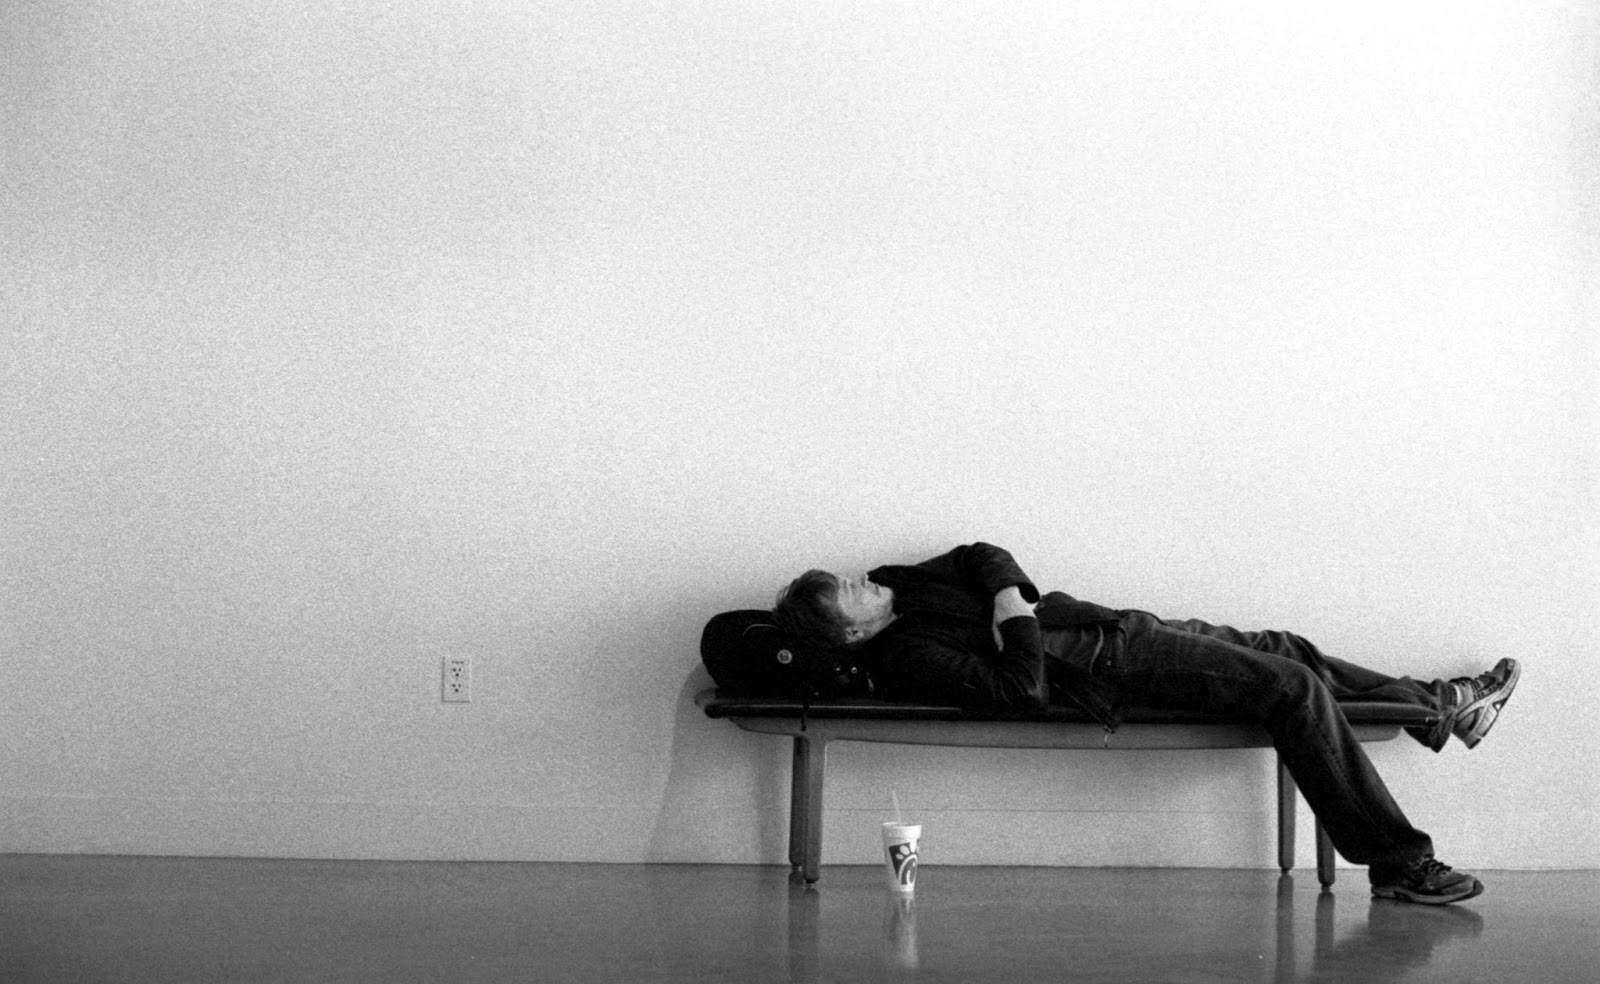 Sleeping Student UT Austin school of Fine Arts building